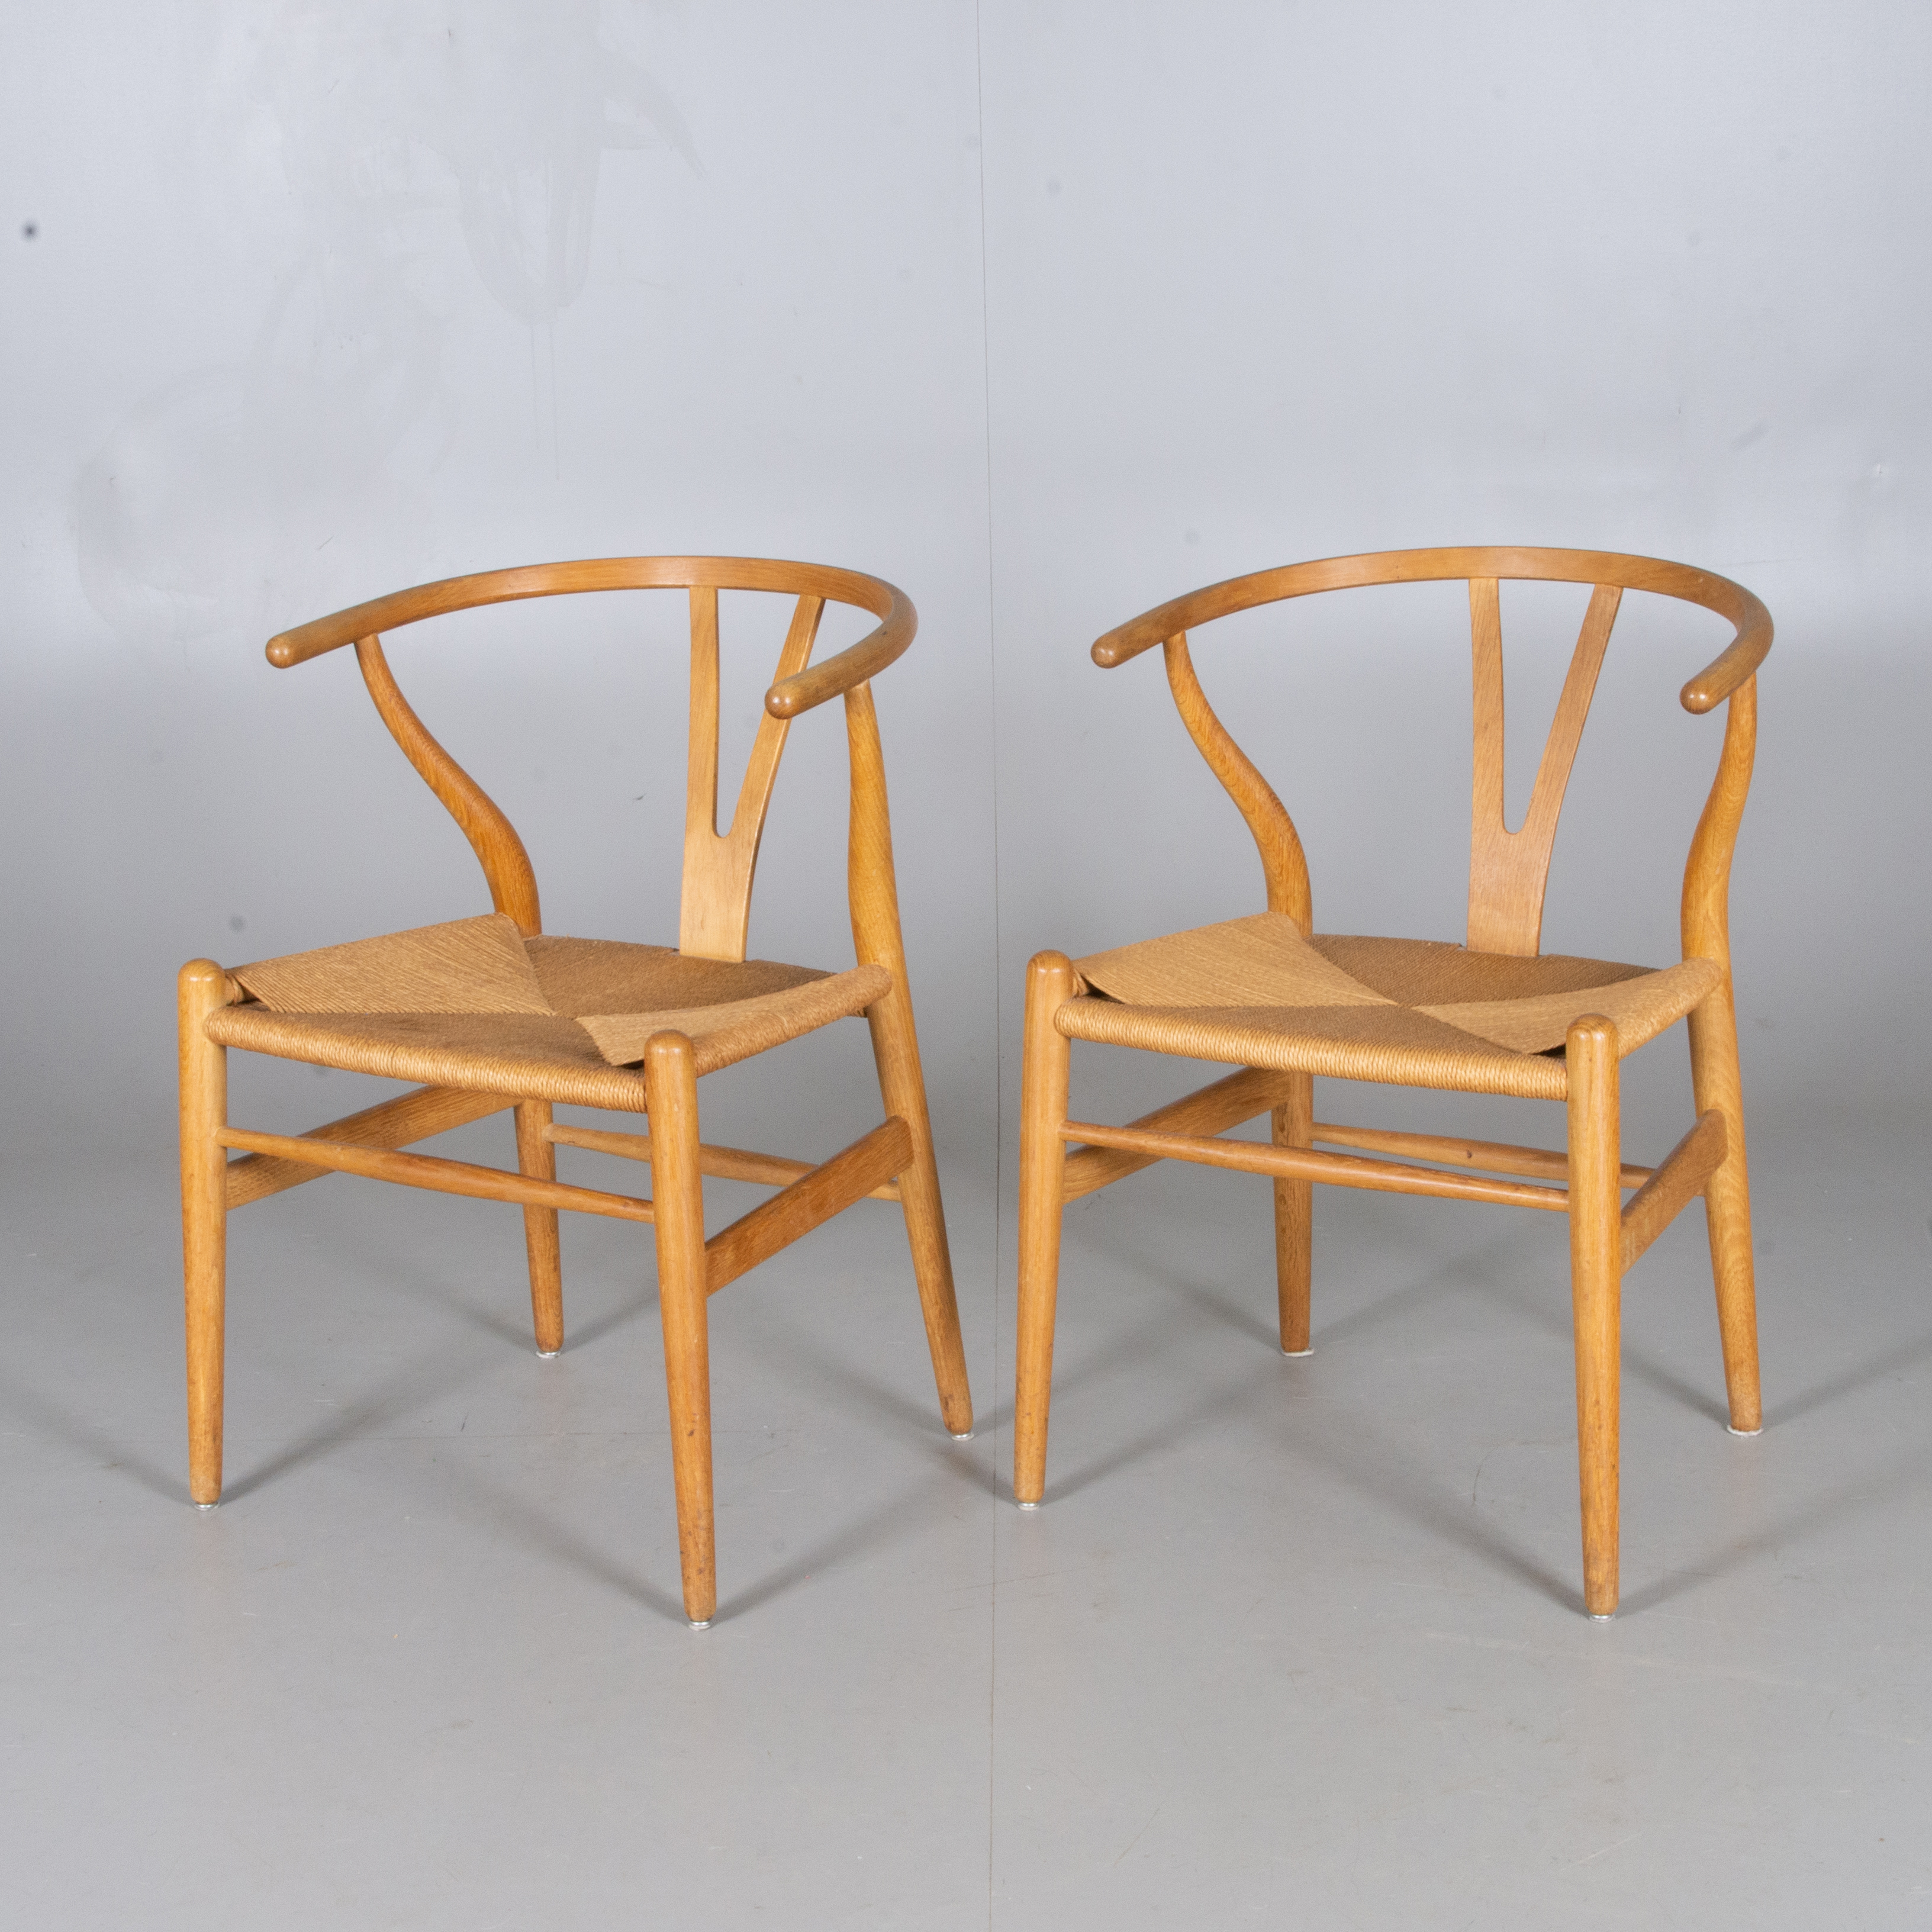 Hans J Wegner Chairs 1 Pair Oak With Lace Seat Carl Hansen Son